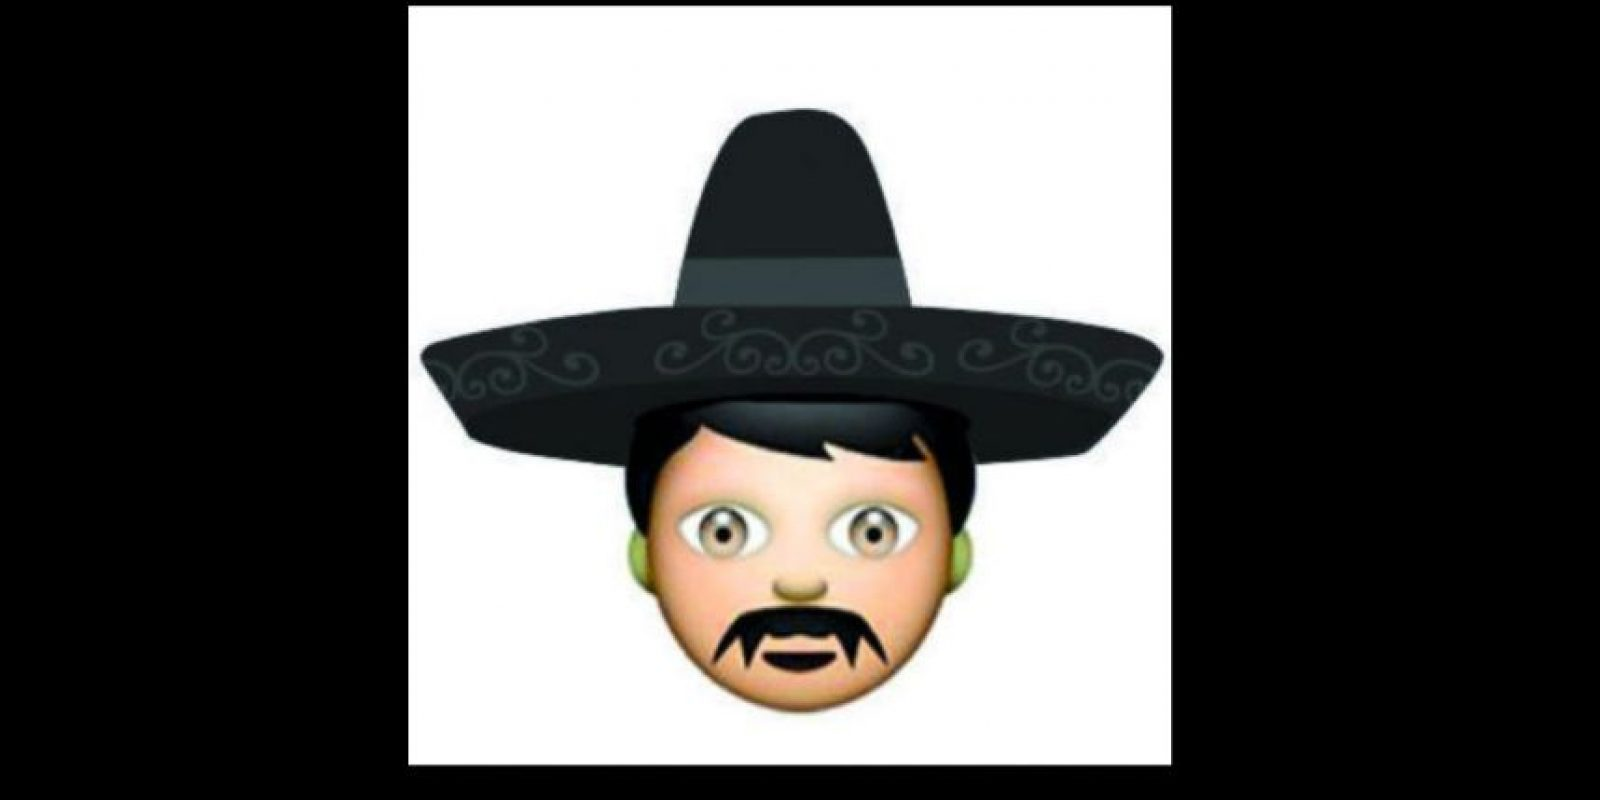 Charro Foto:Emojipedia